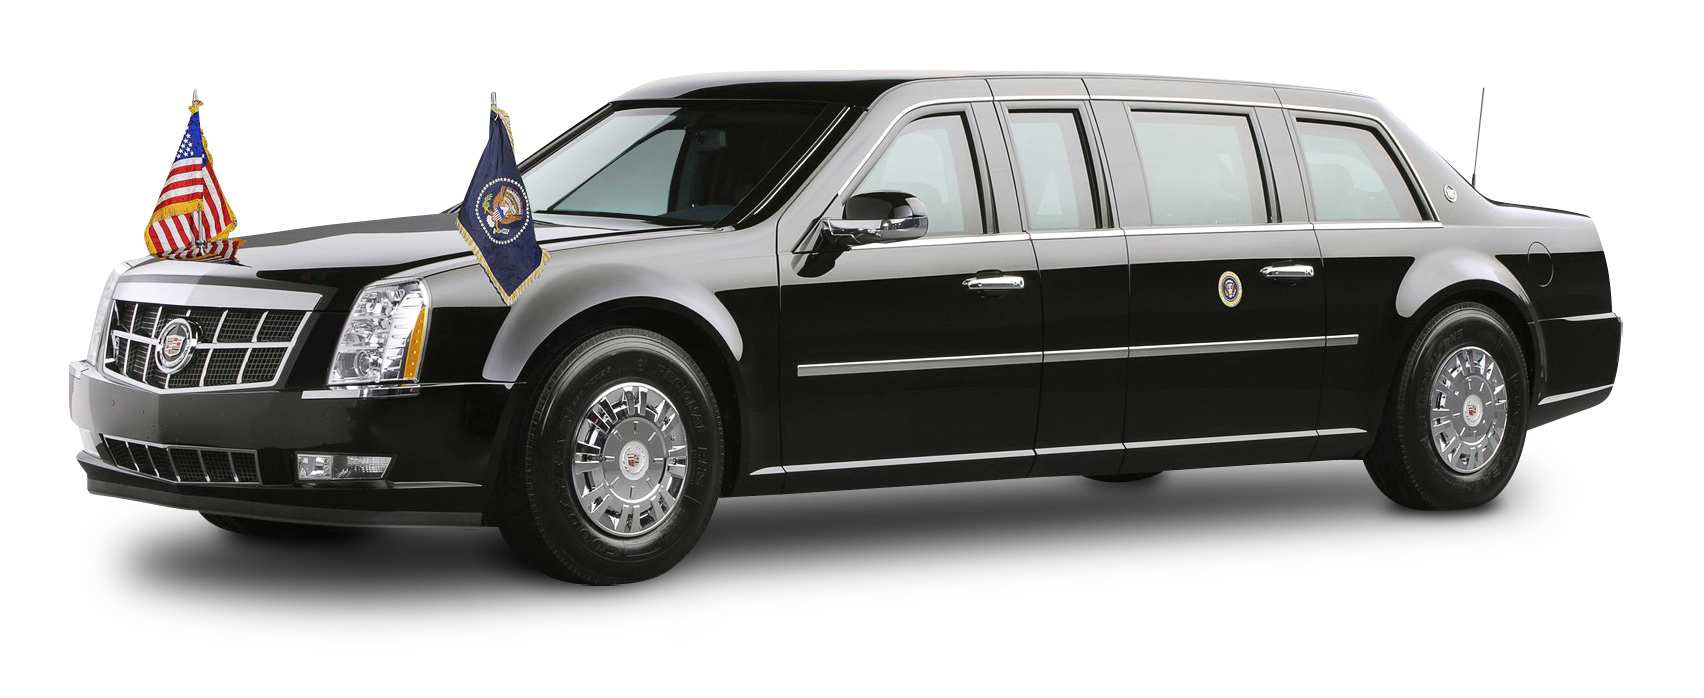 Cadilac car clipart png transparent download Cadillac Presidential Limousine Car PNG Image - PngPix png transparent download